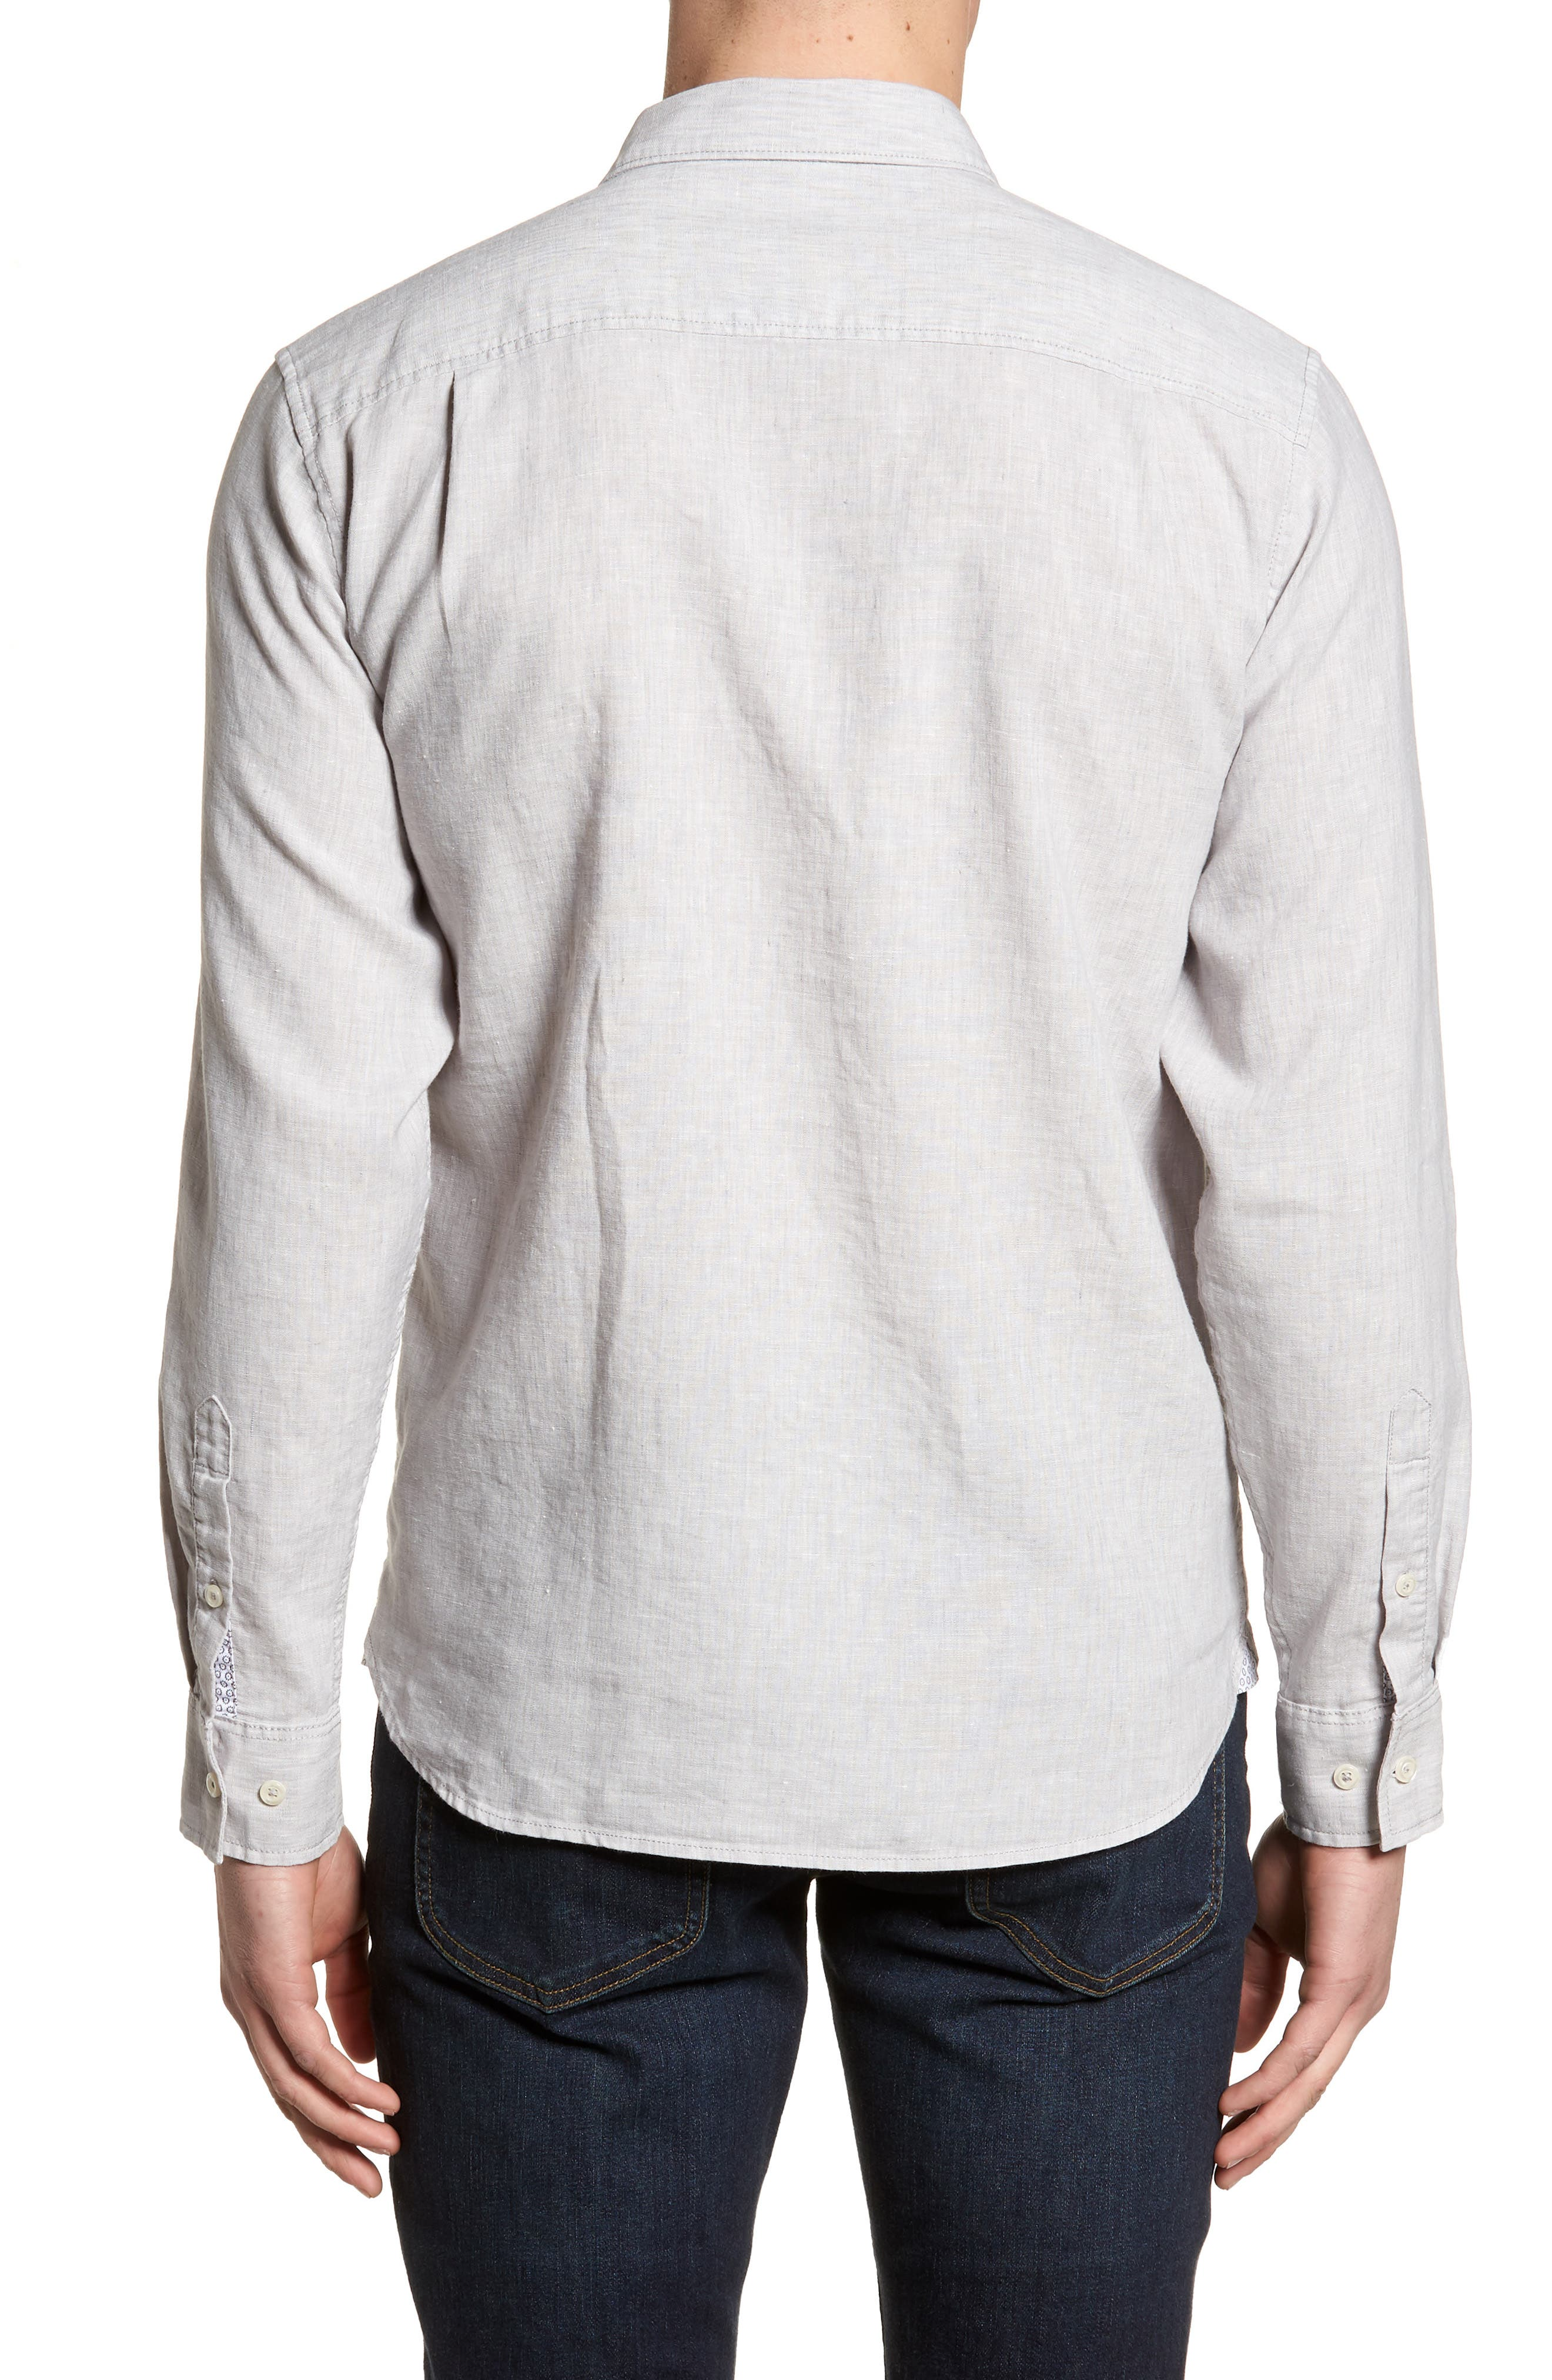 Lanai Tides Linen Blend Sport Shirt,                             Alternate thumbnail 2, color,                             020